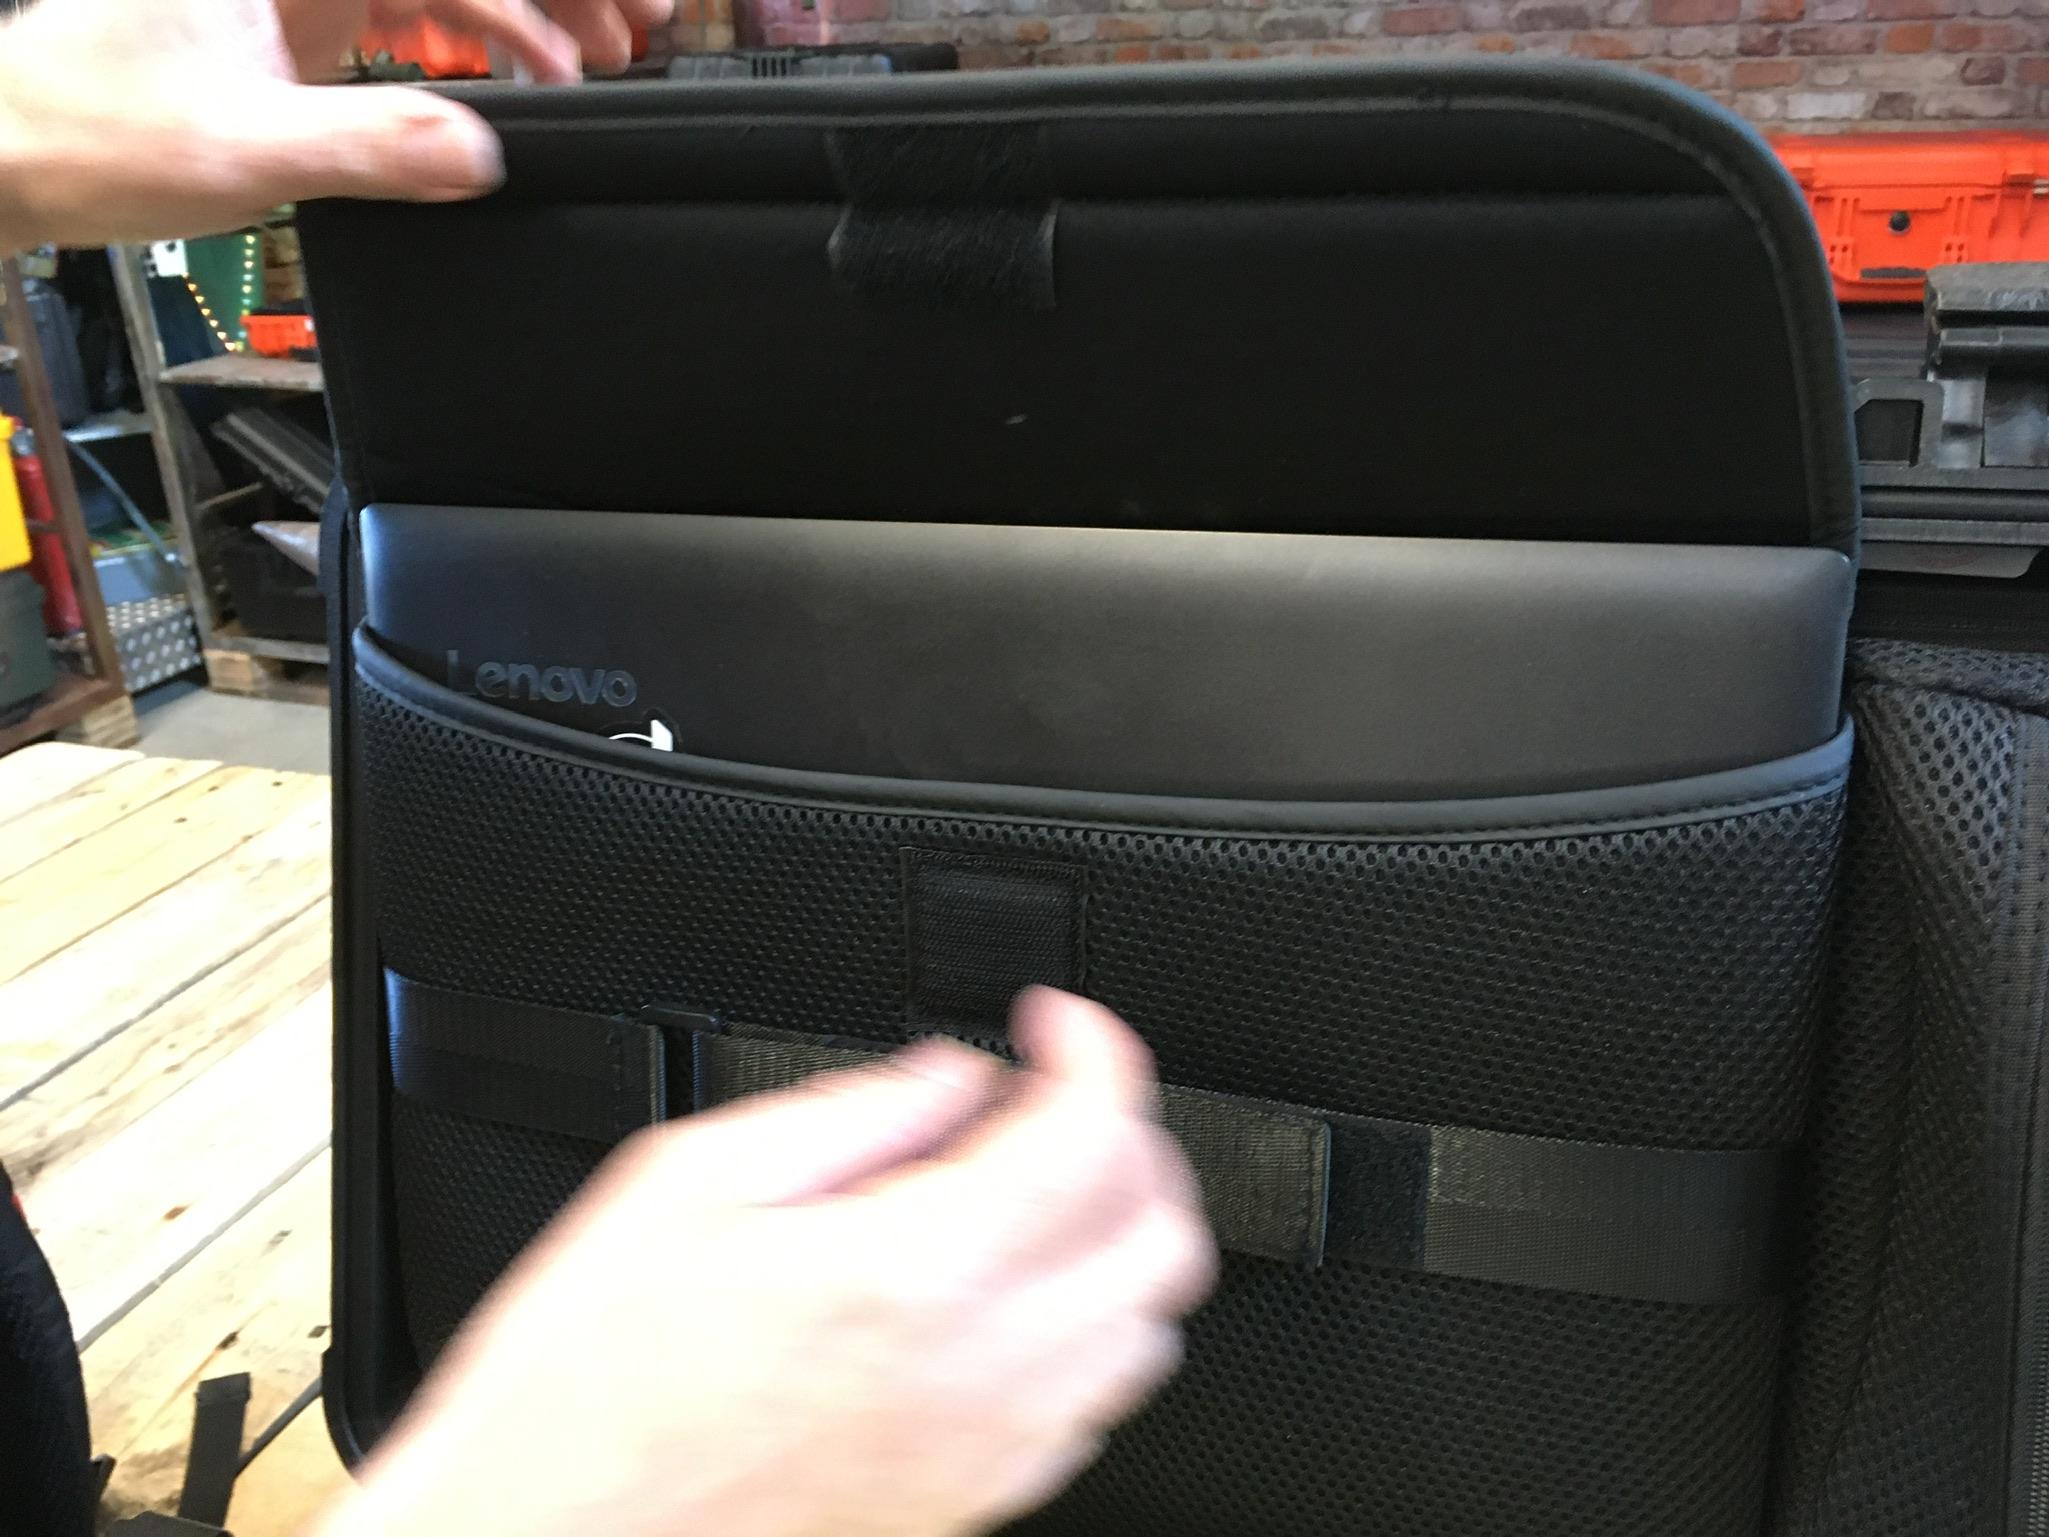 Peli Case 1510 SC Laptoptasche 15,4 Zoll